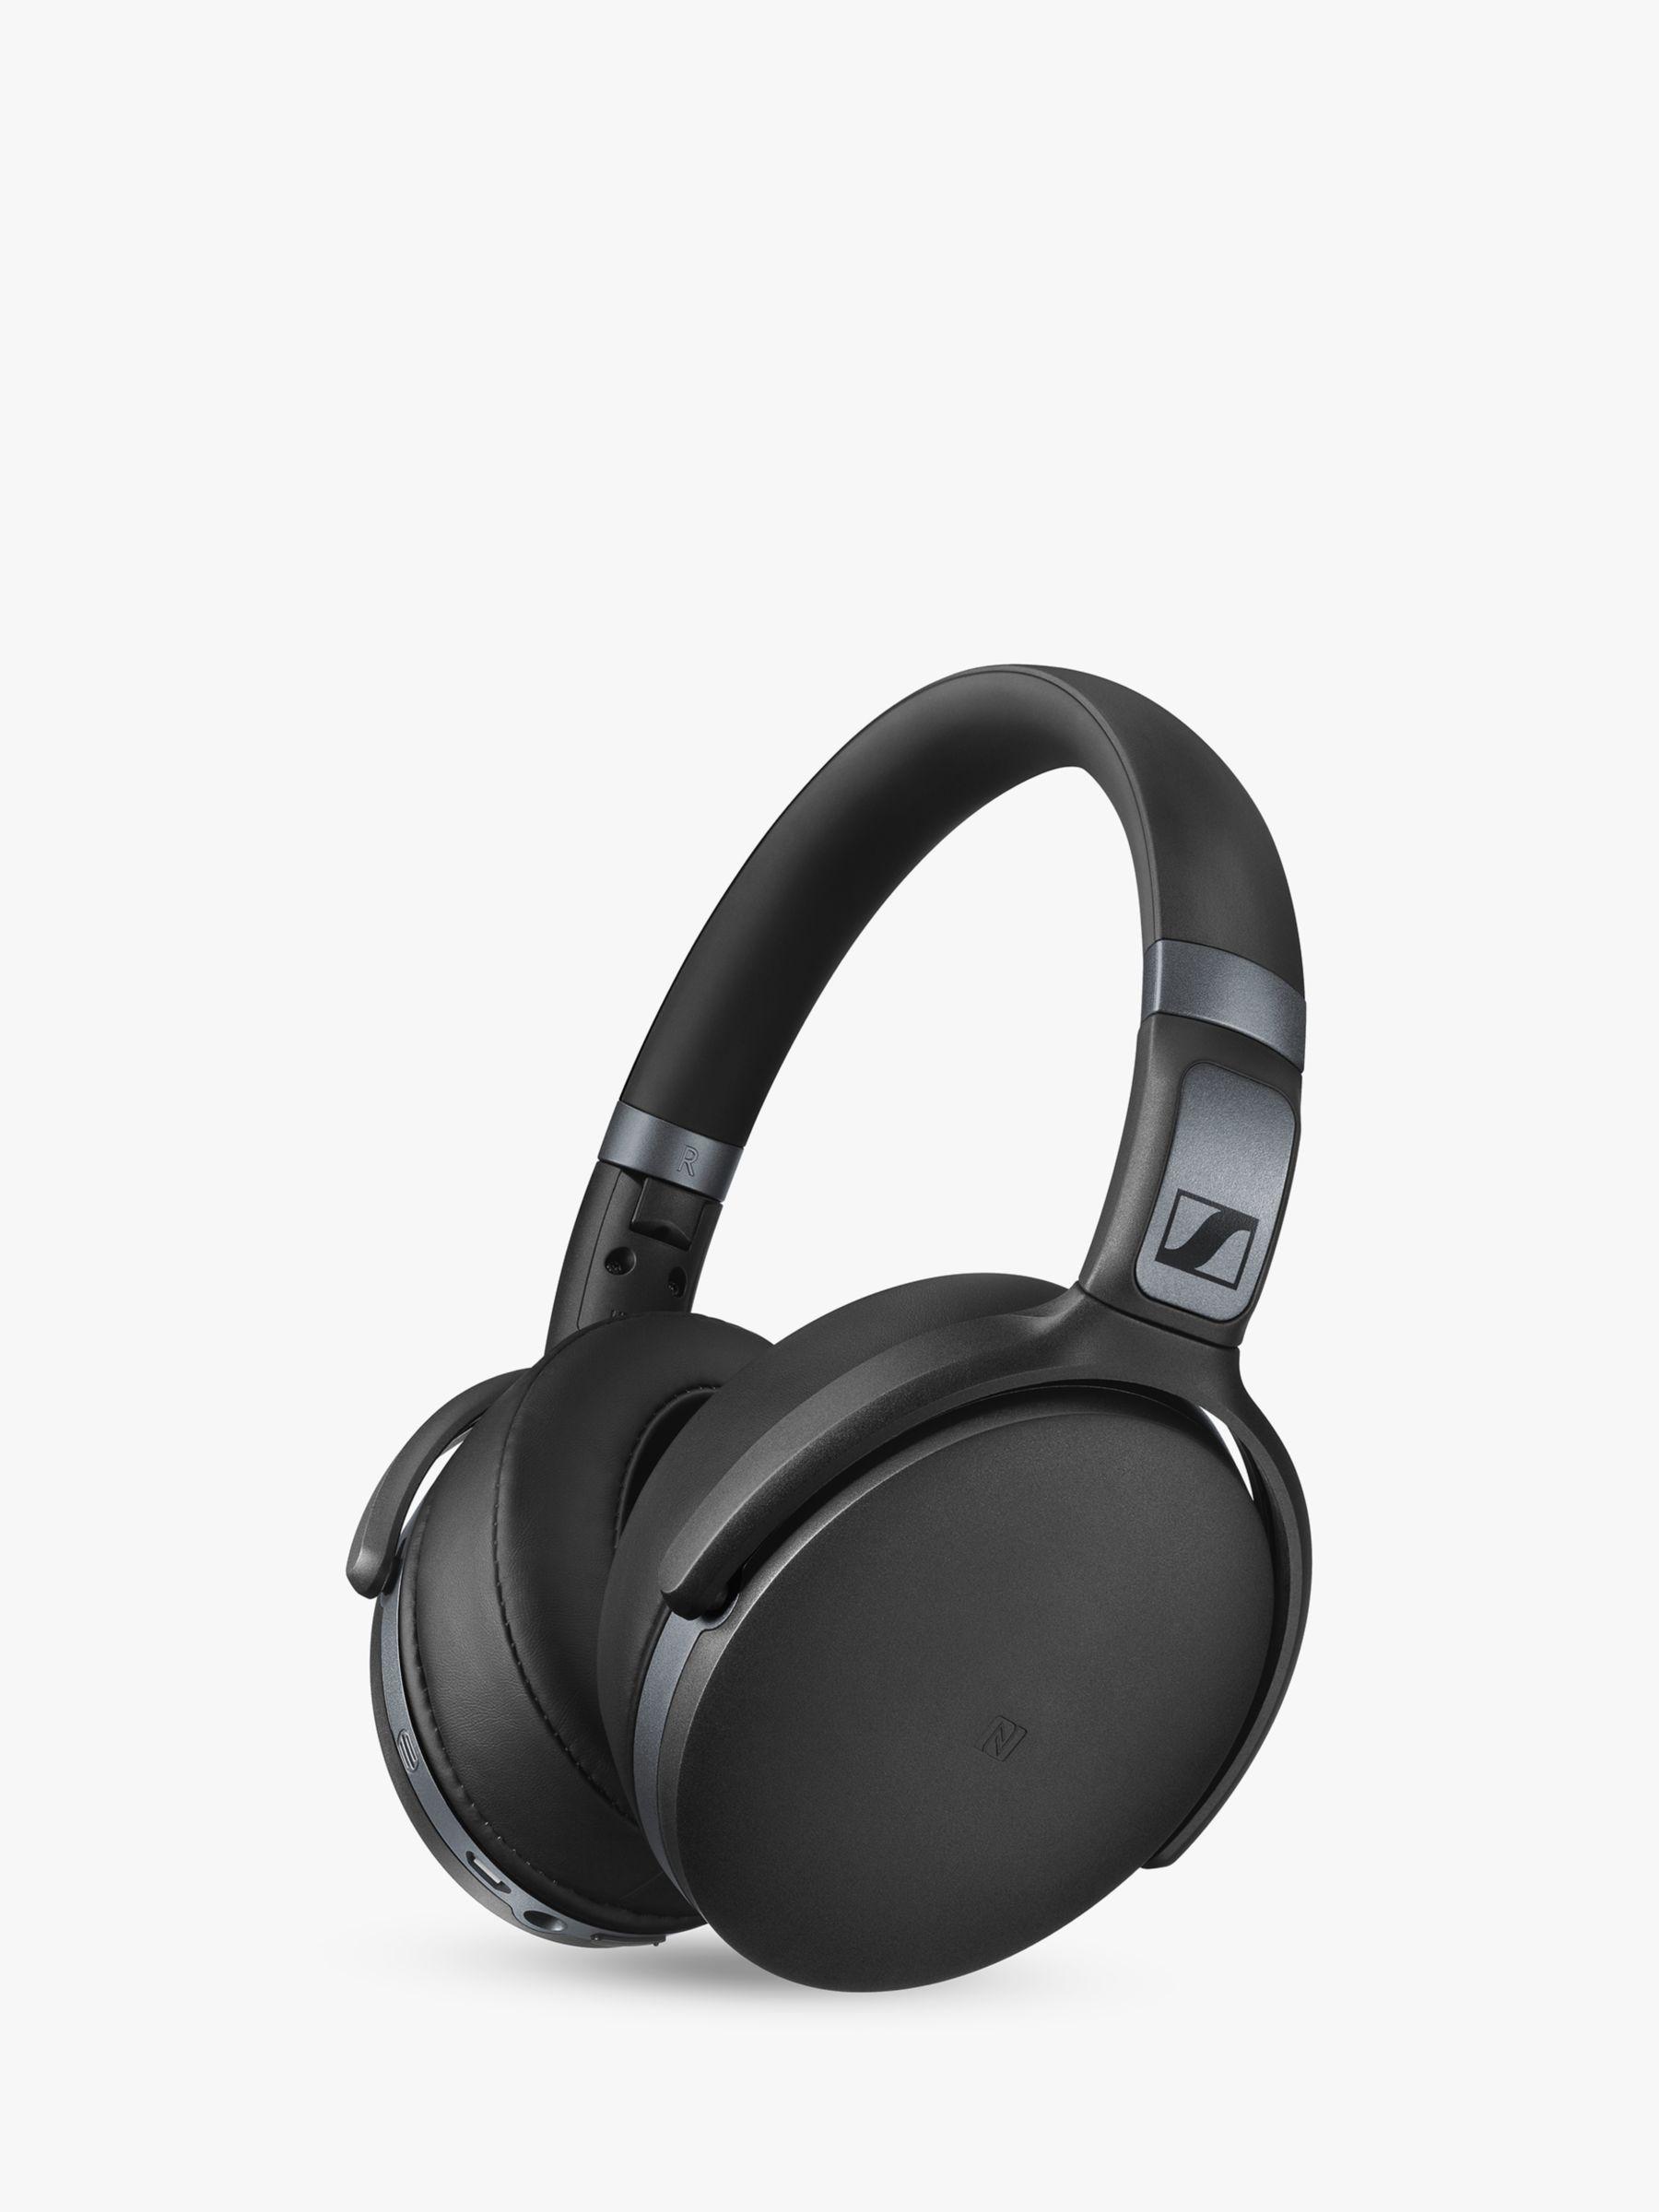 Sennheiser Sennheiser HD 4.40 Bluetooth/NFC Wireless Over-Ear Headphones with Inline Microphone & Remote, Black